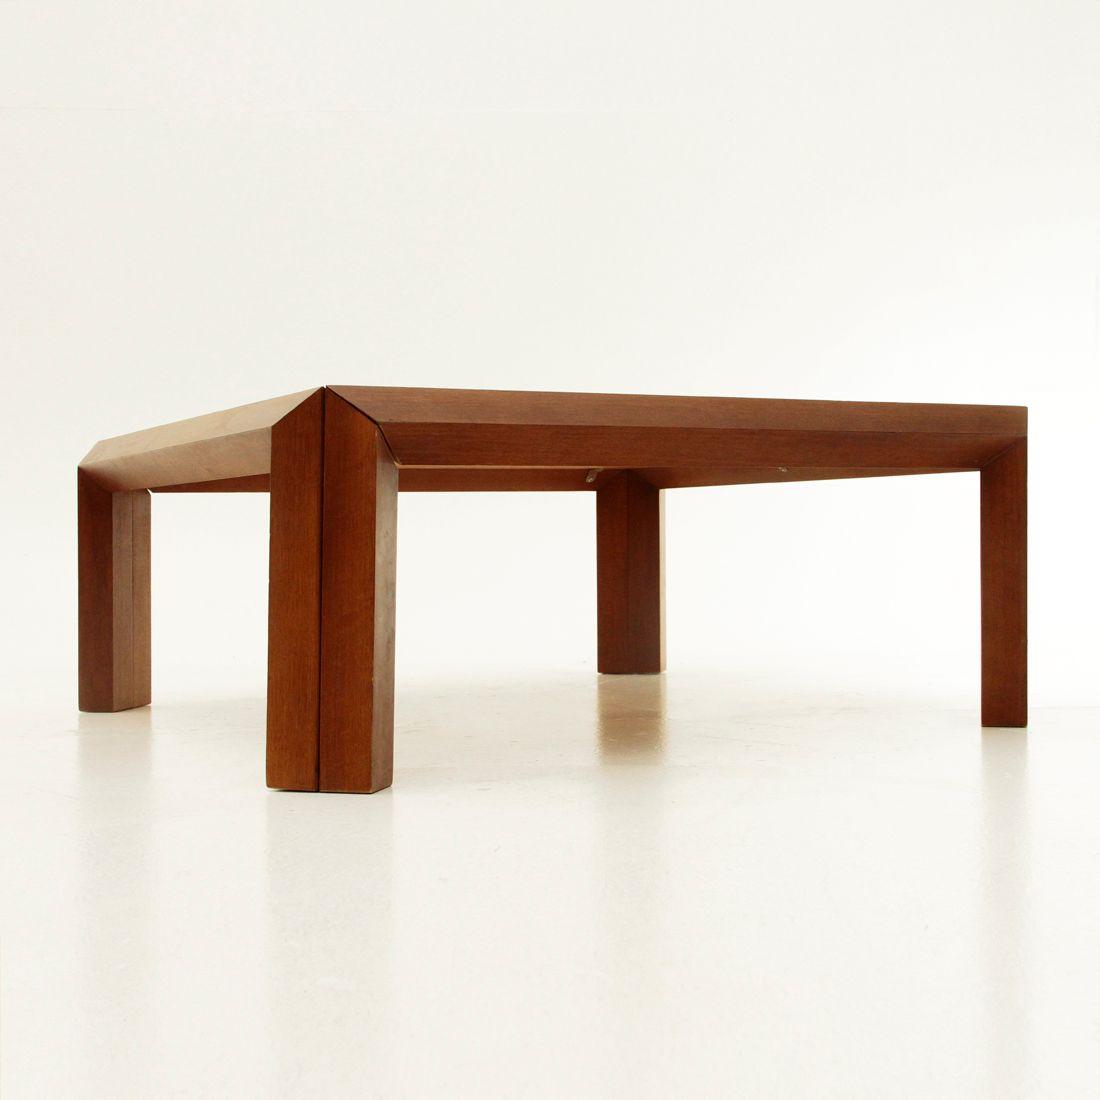 quadratischer italienischer couchtisch aus holz 1980er. Black Bedroom Furniture Sets. Home Design Ideas